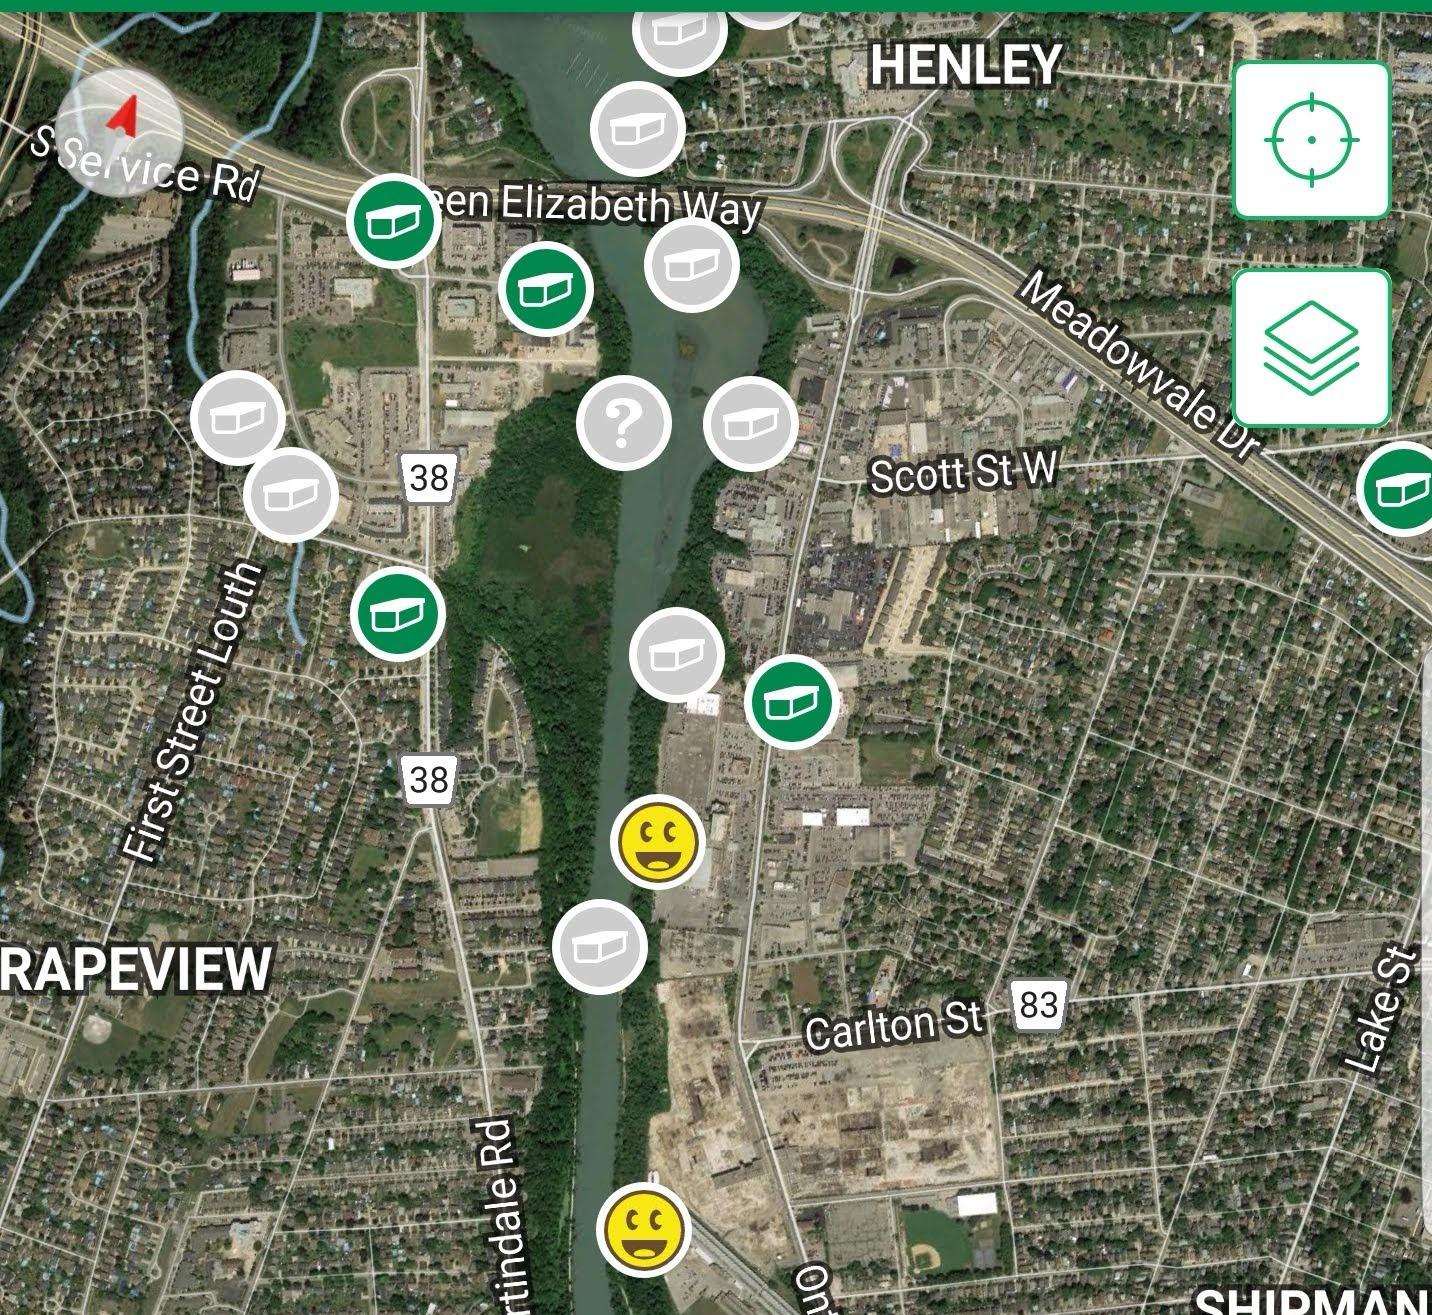 Geocache map